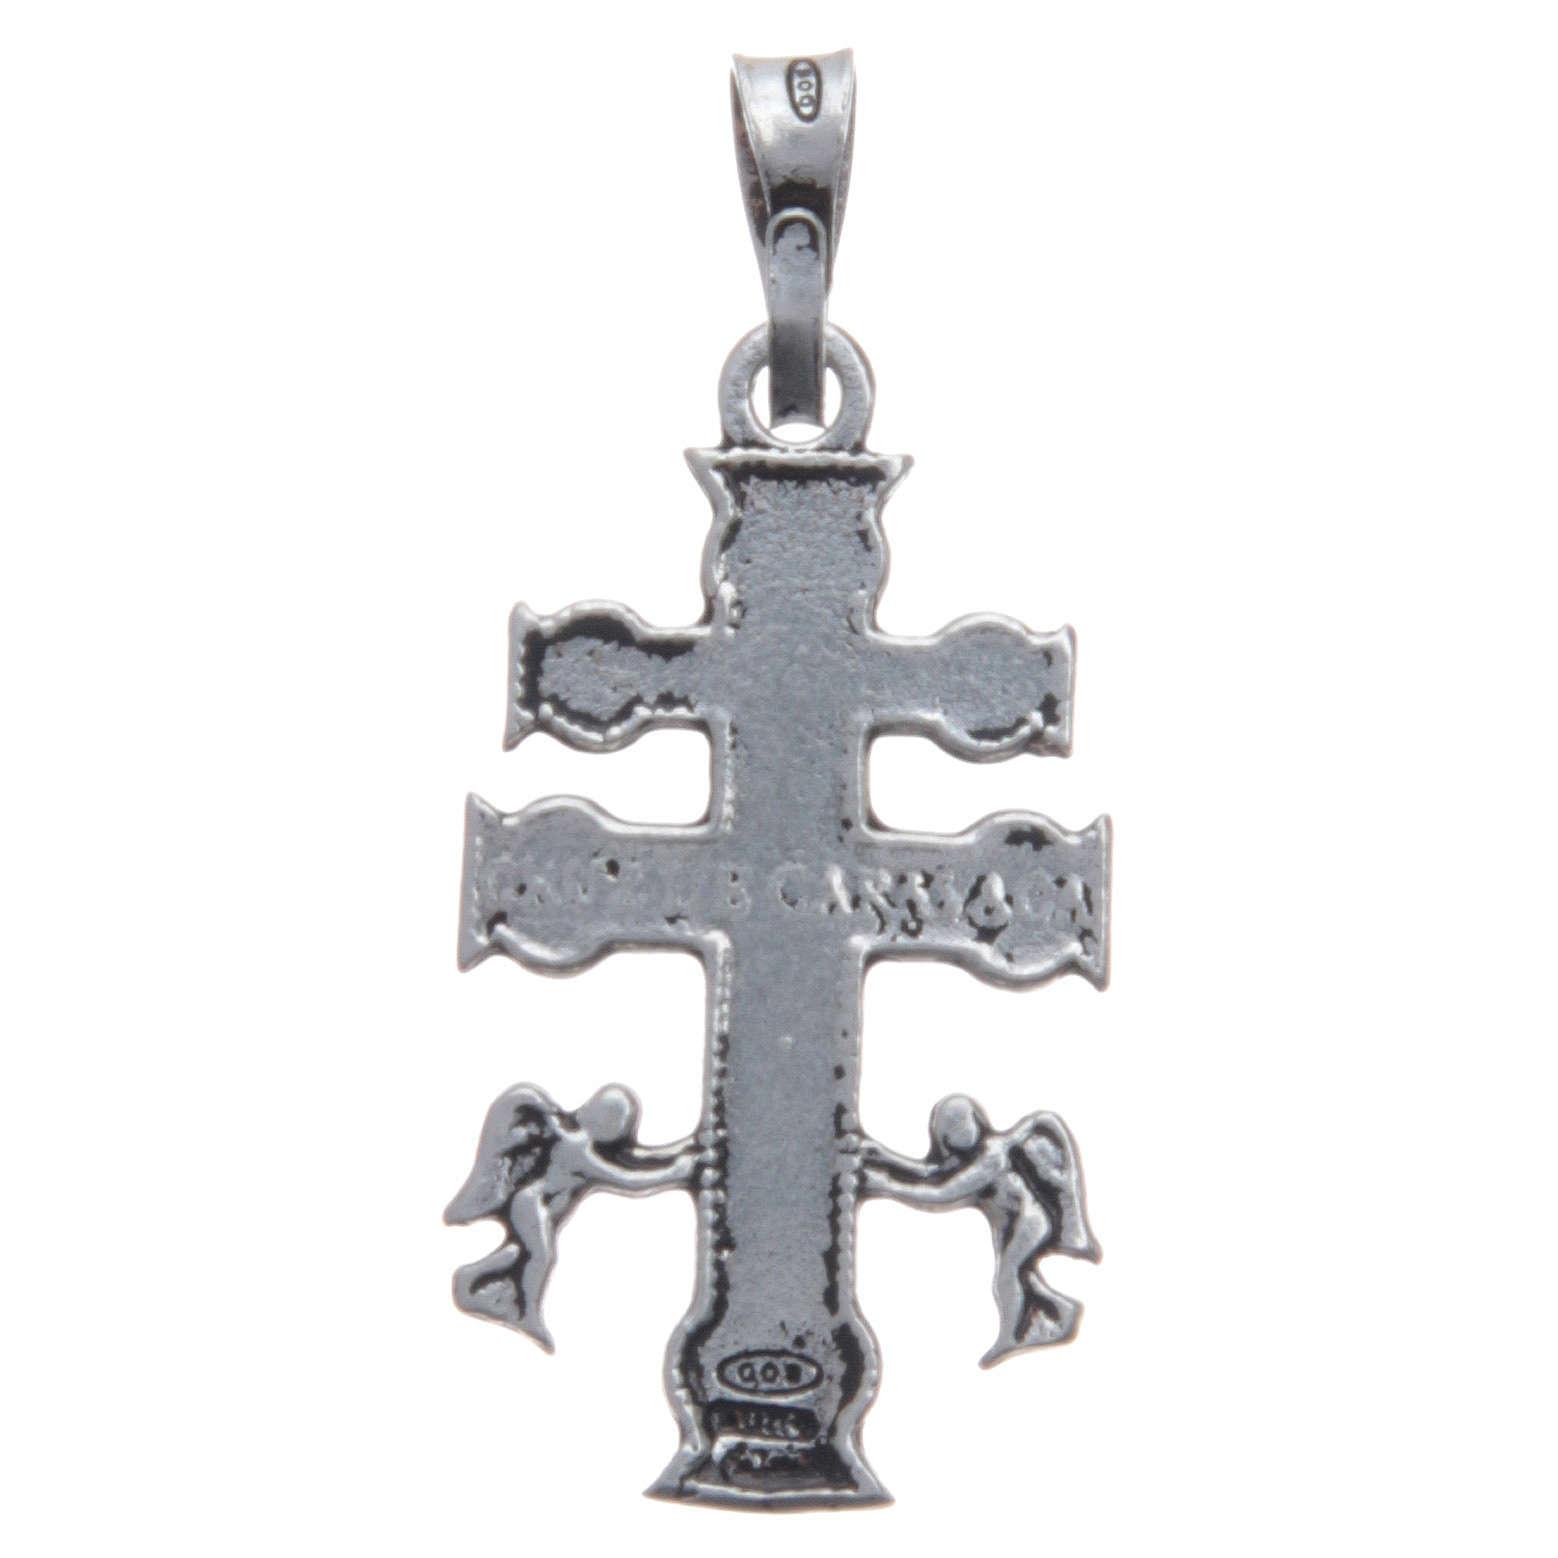 Croix de Caravaca en argent 925 4